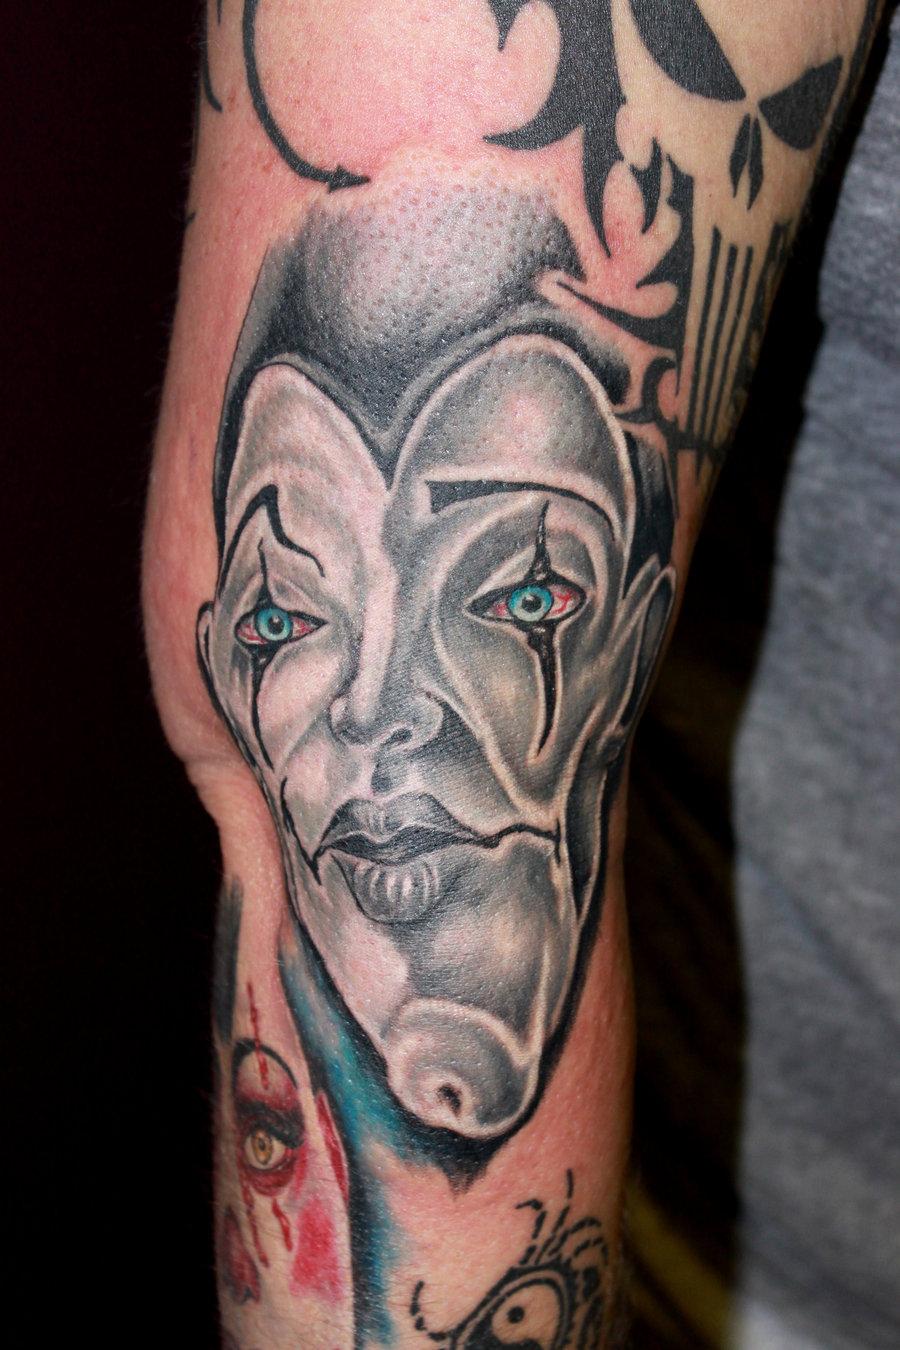 Gangster Clowns Tattoos: Creepy Gangster Tattoo On Right Sleeve